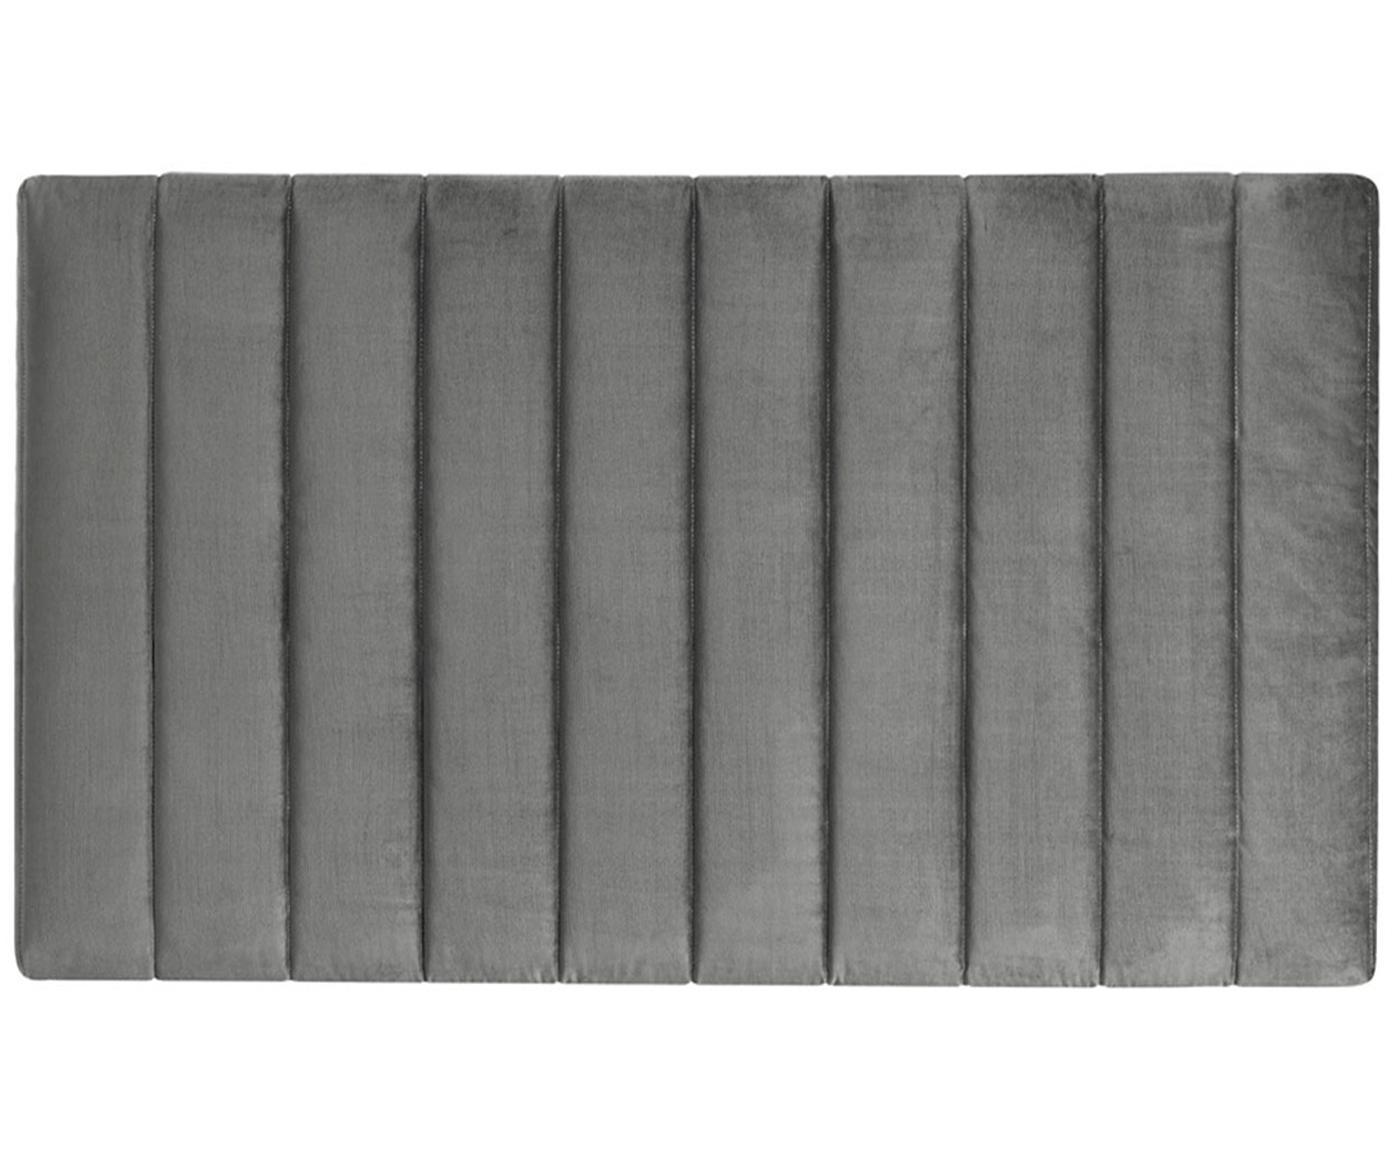 Cabecero Paris Dot, Estructura: tablero de fibras de dens, Tapizado: 100%poliéster efecto ter, Interior: guata doble 500g (100%p, Gris antracita, An 135 x Al 80 cm